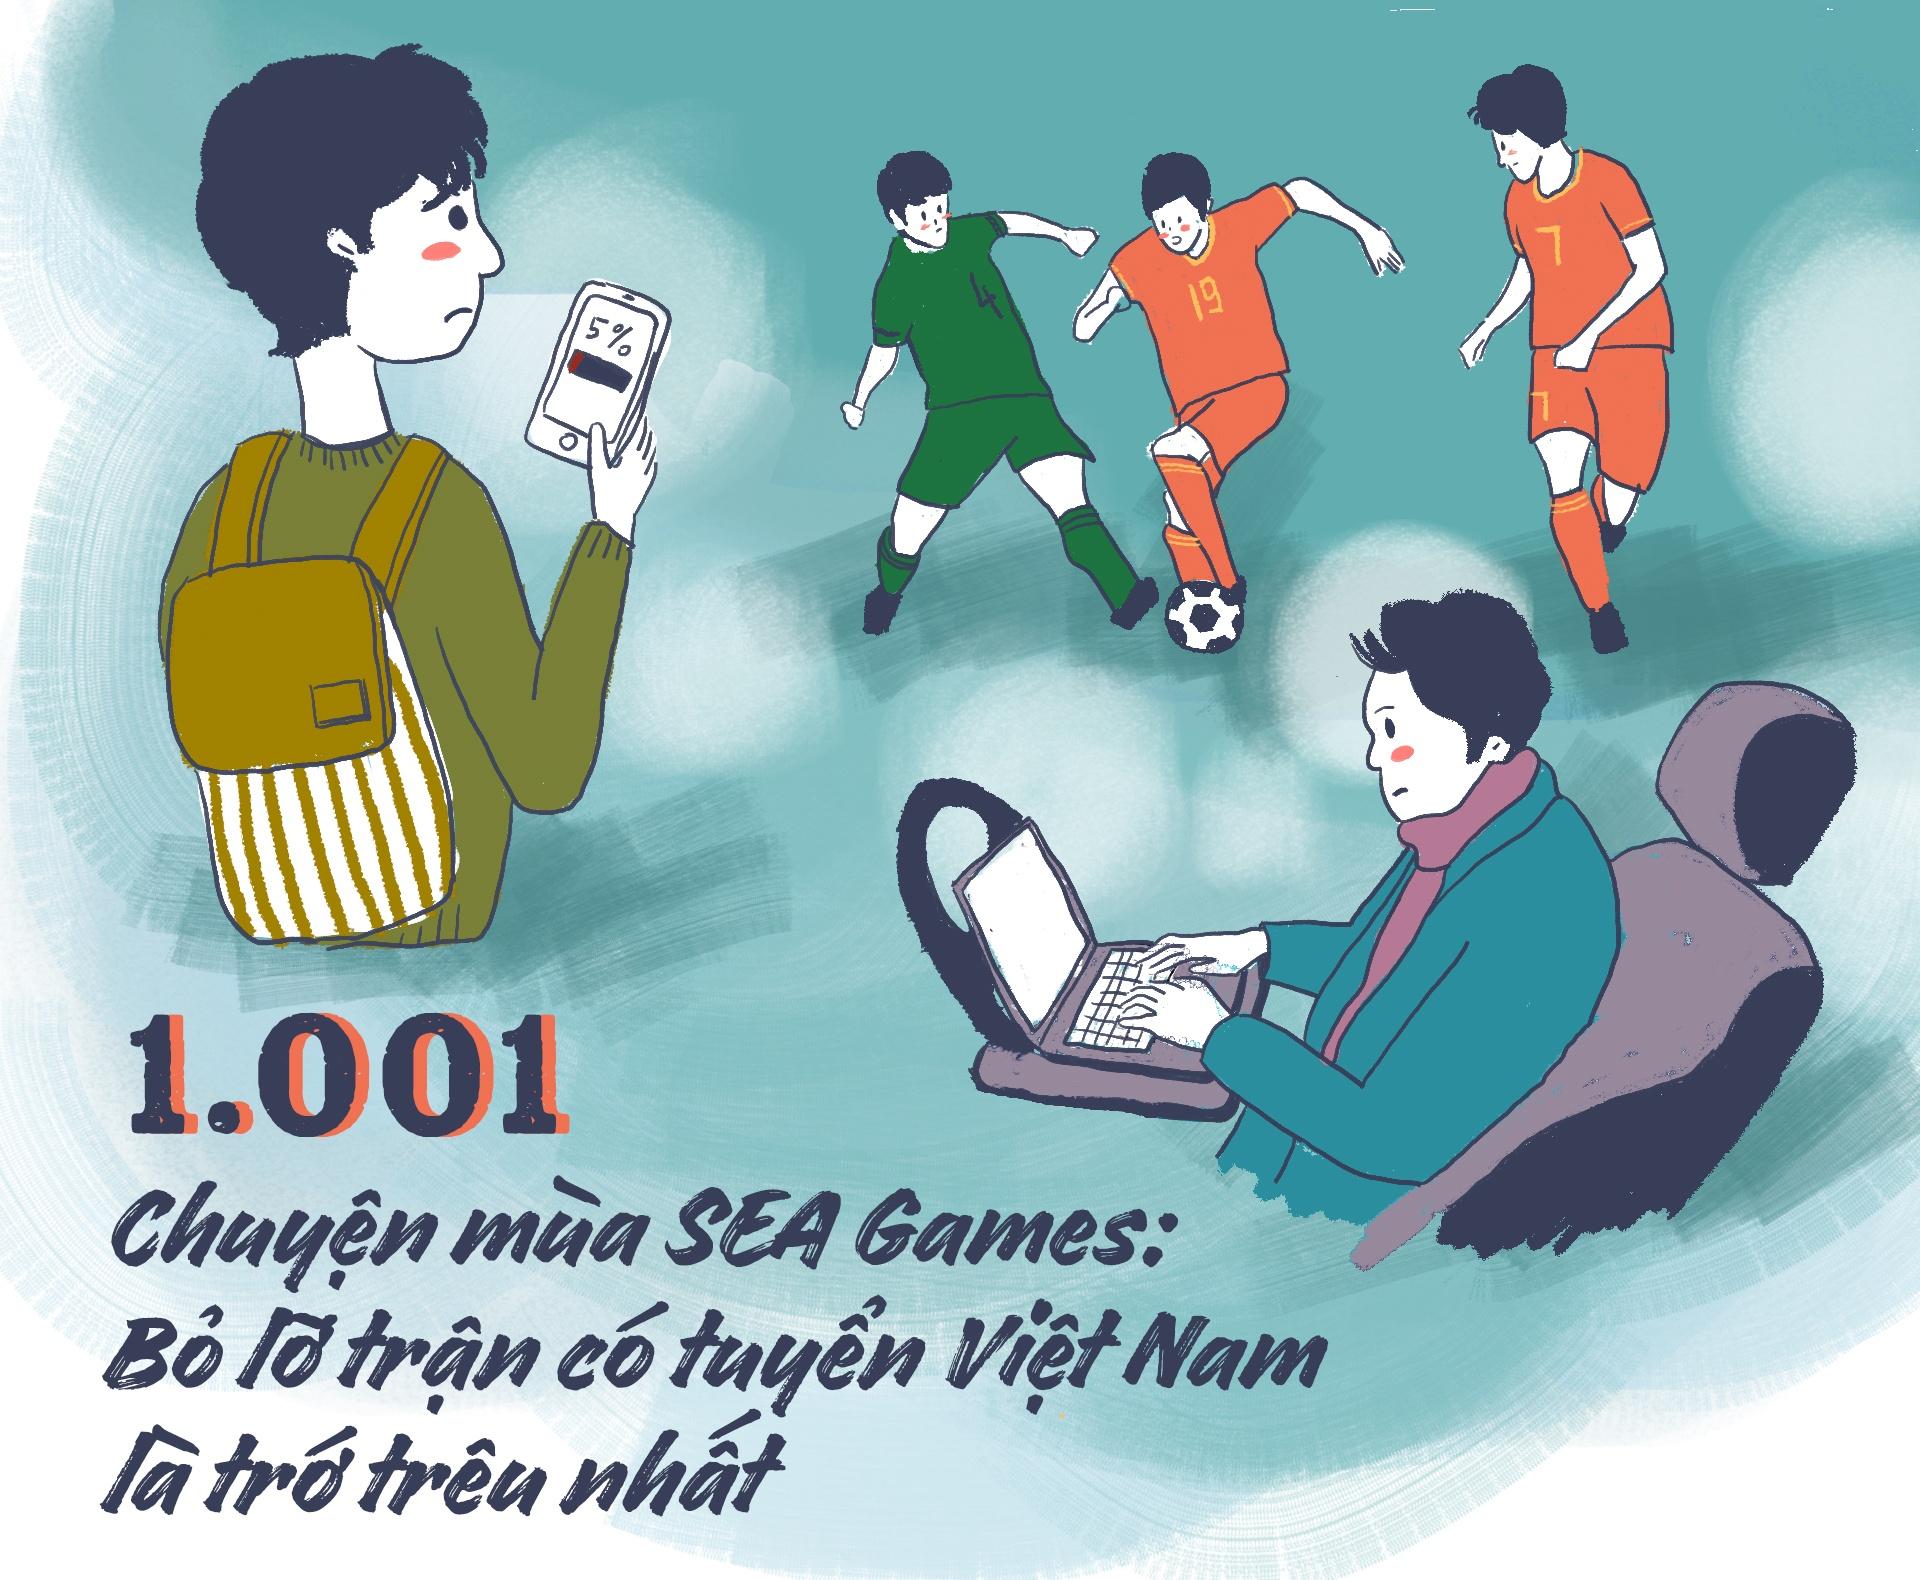 1.001 chuyen mua SEA Games: Bo lo tran co tuyen VN la tro treu nhat hinh anh 2